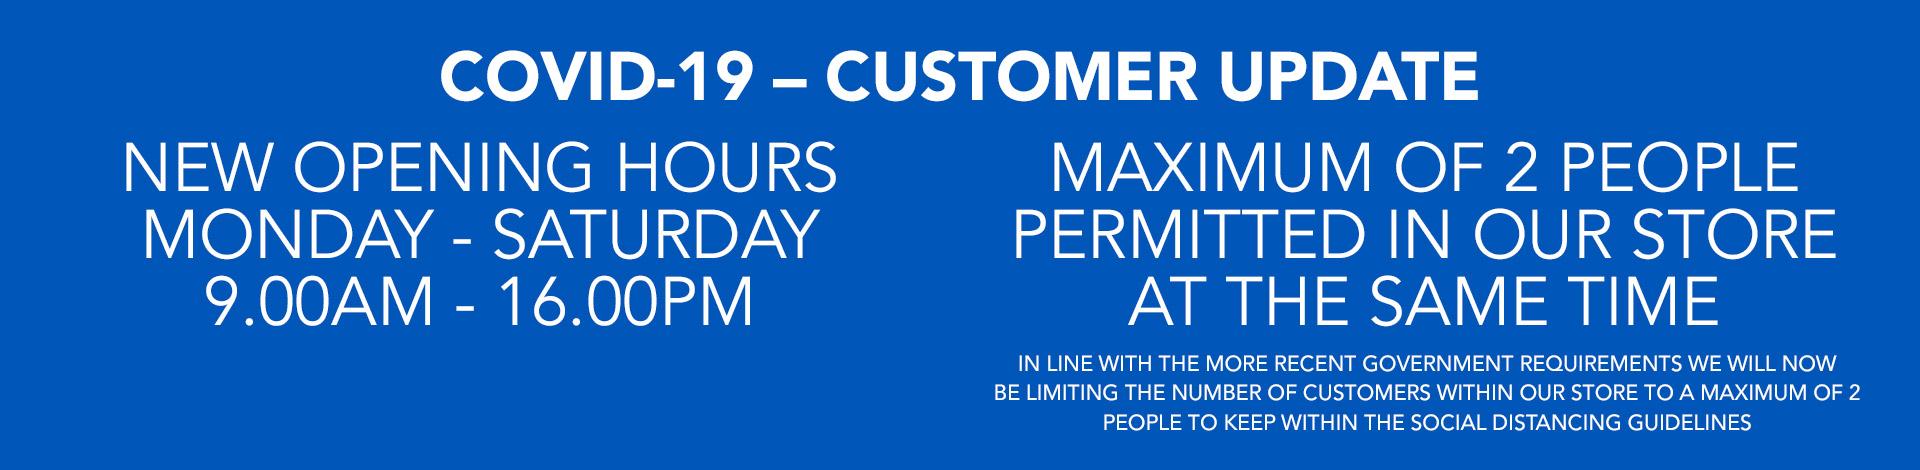 Covid19 Customer Update March 23